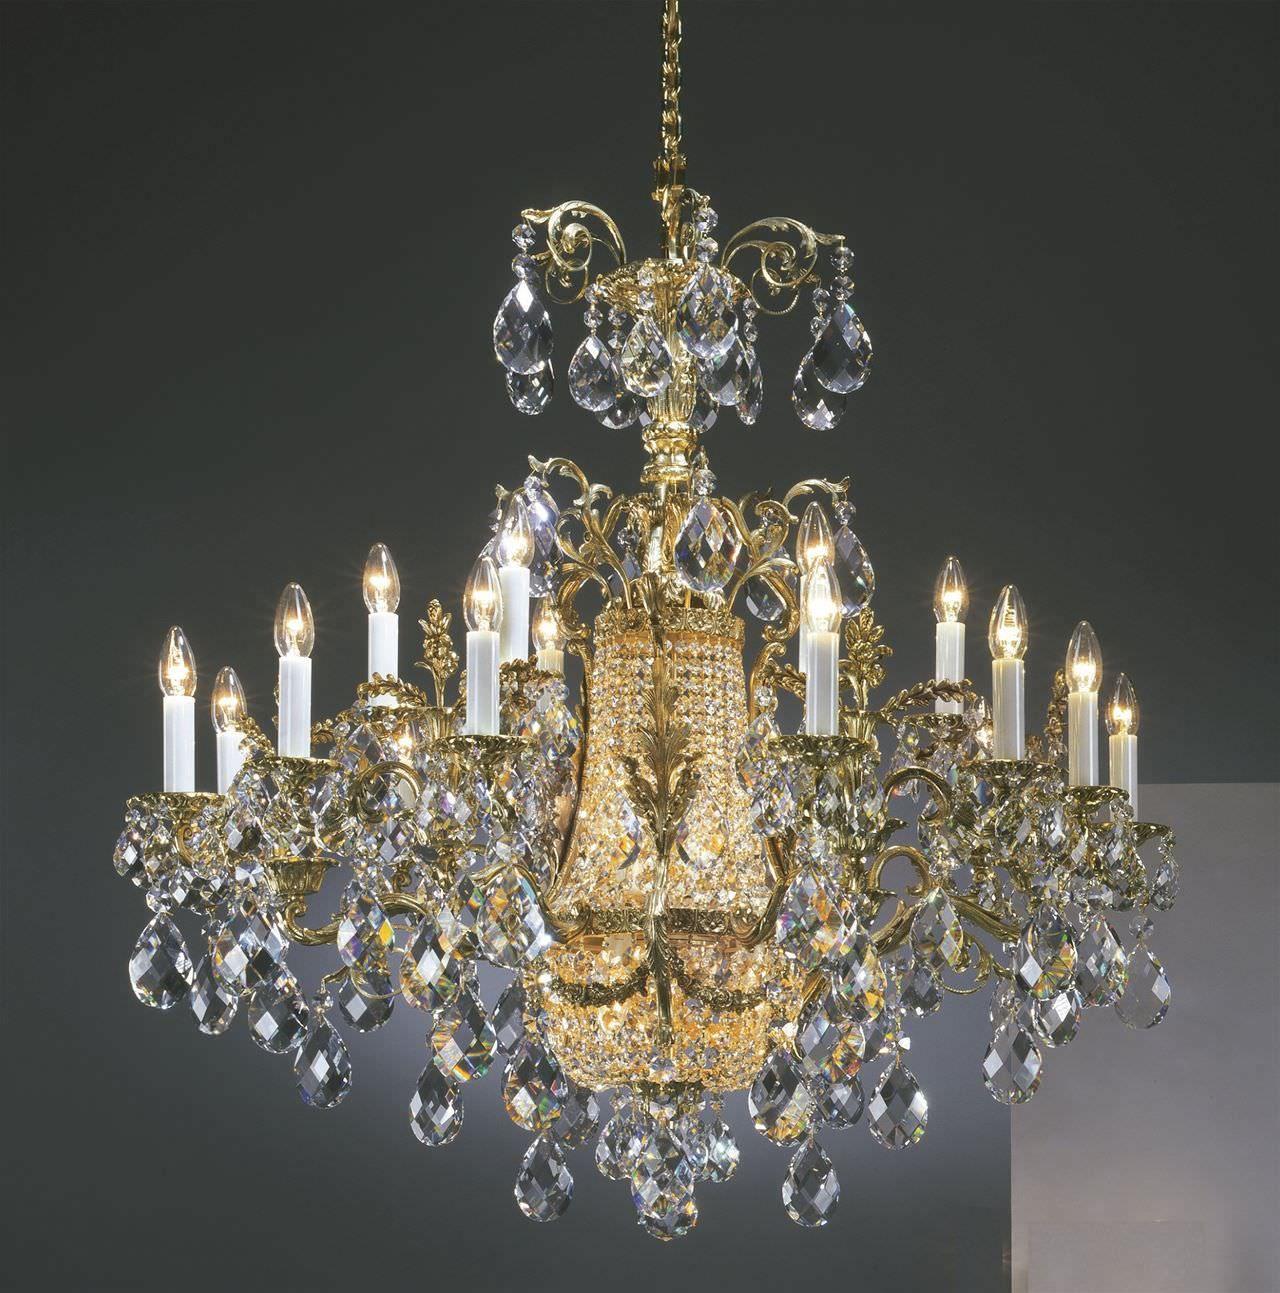 Lamparas ara a antiguas buscar con google lamparas - Lamparas cristal antiguas ...